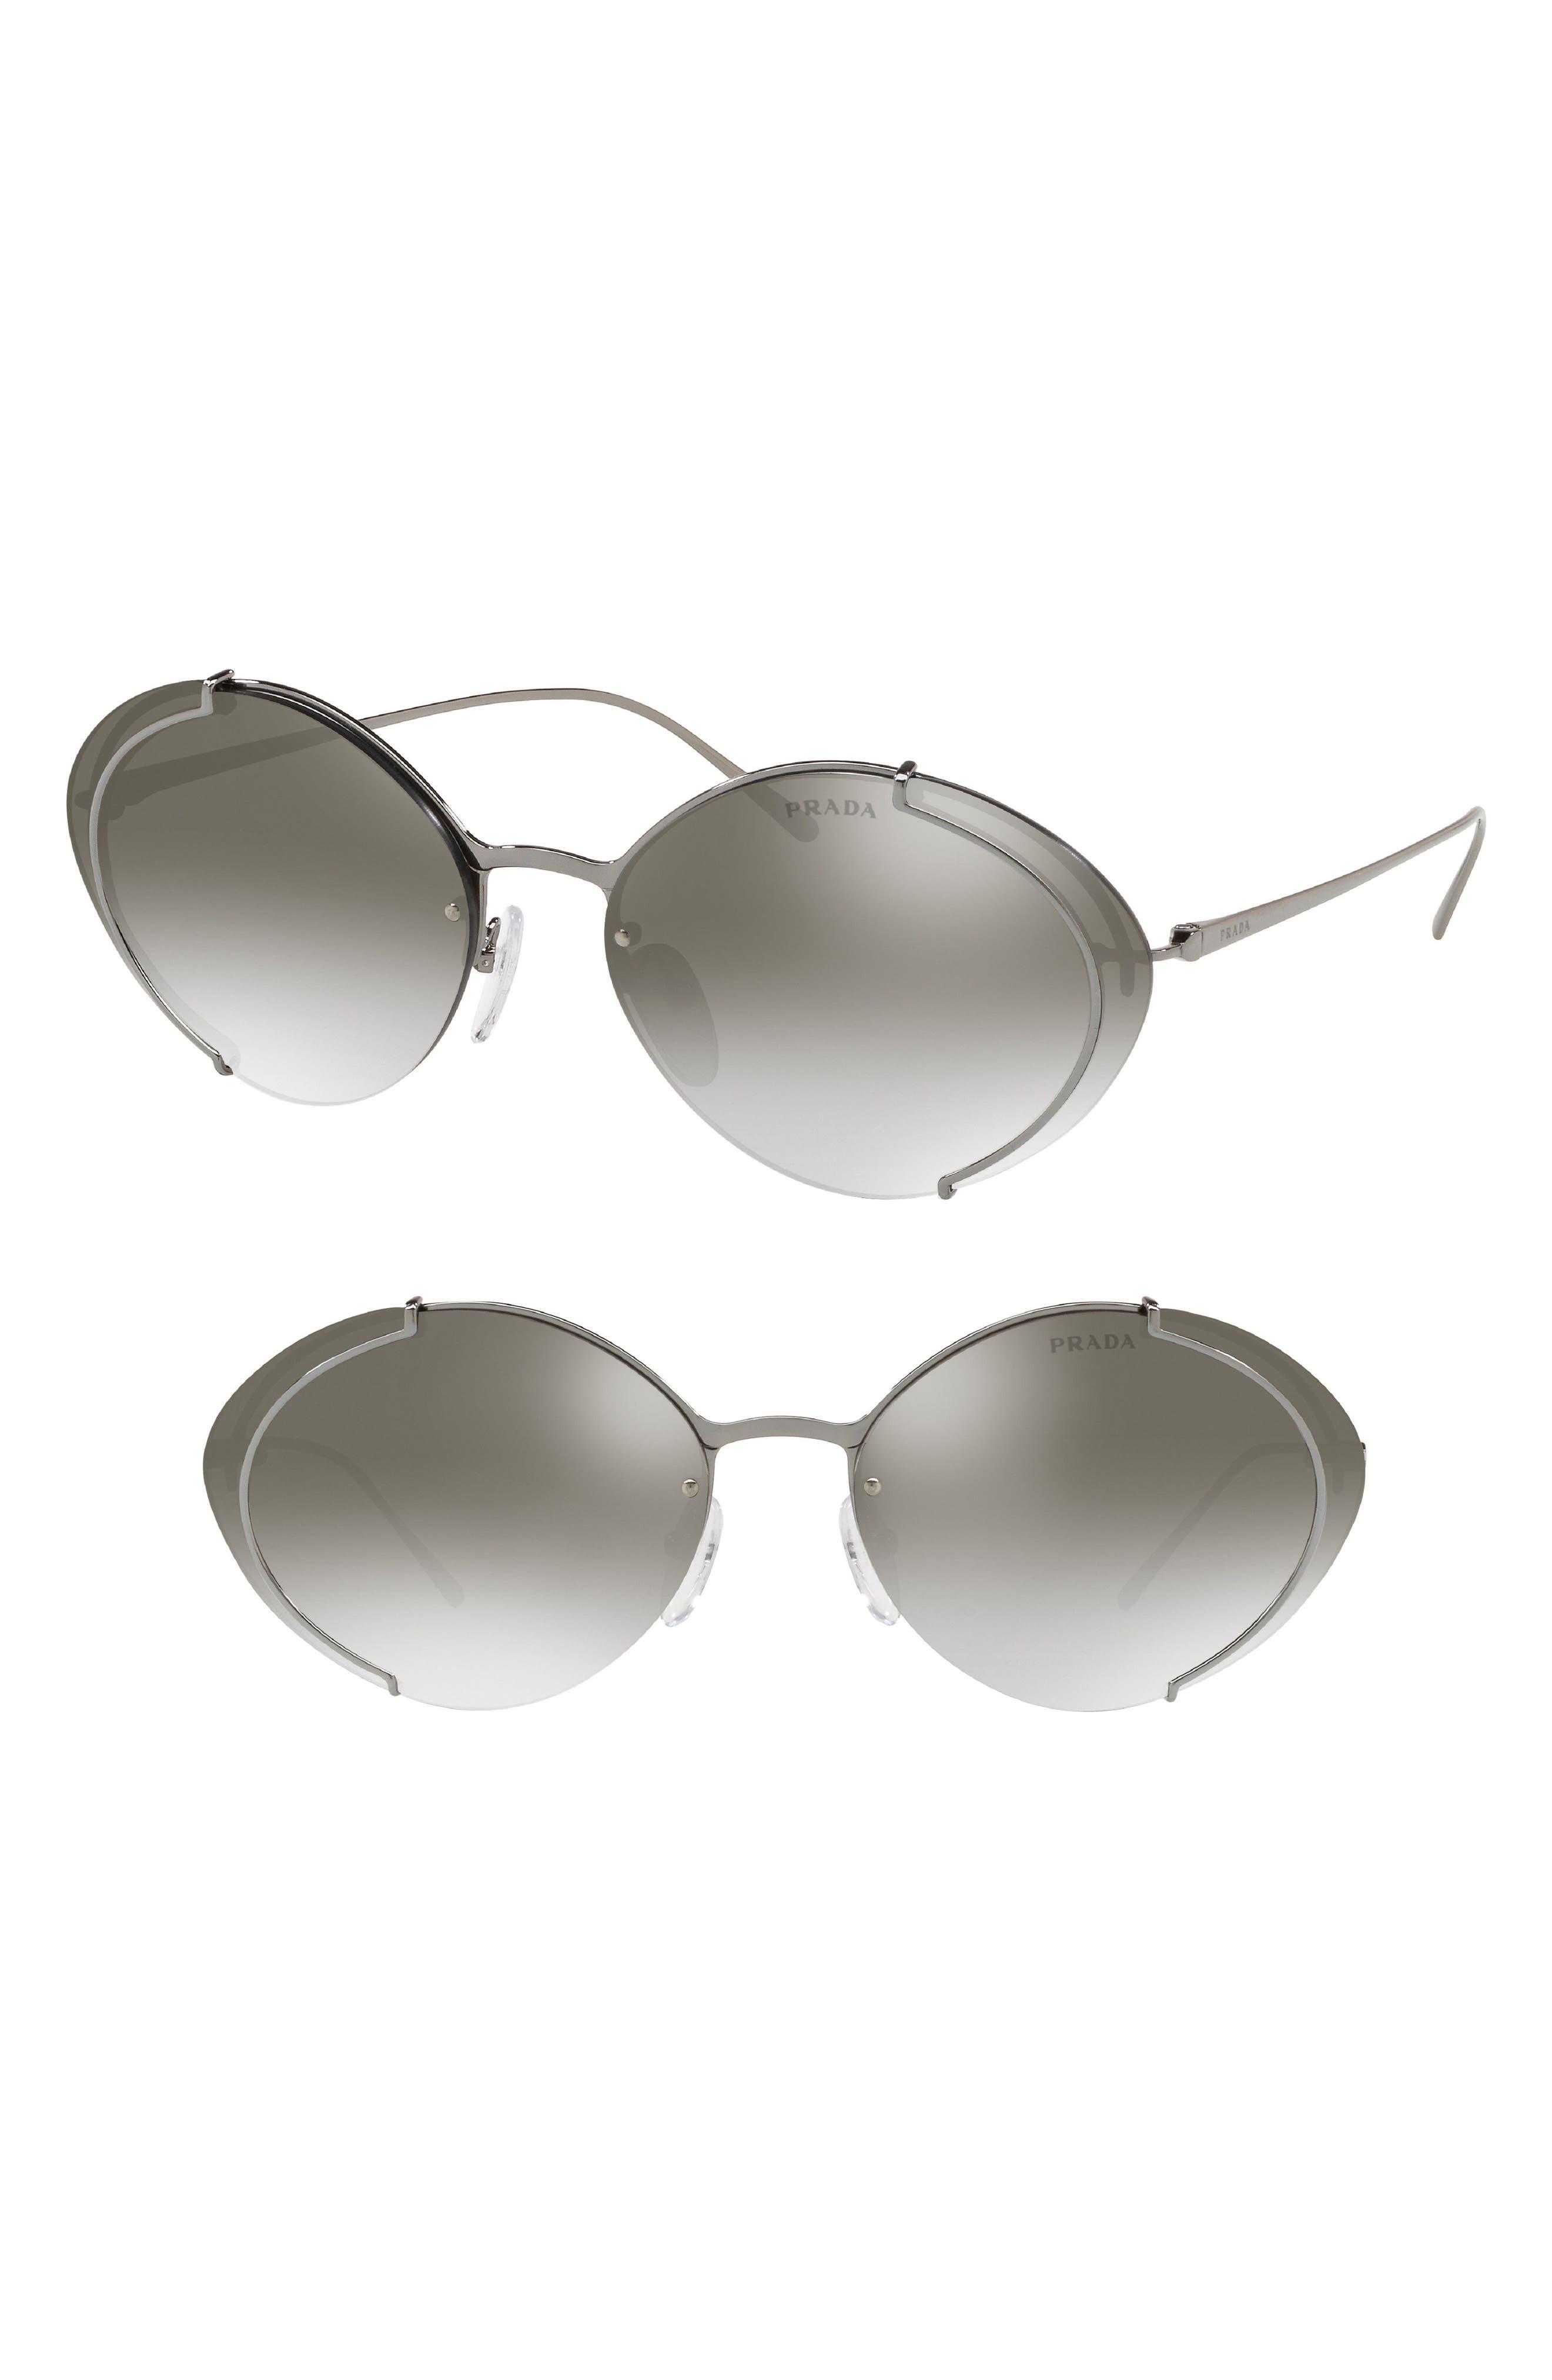 Evolution 63mm Oversize Rimless Oval Sunglasses,                         Main,                         color, 040